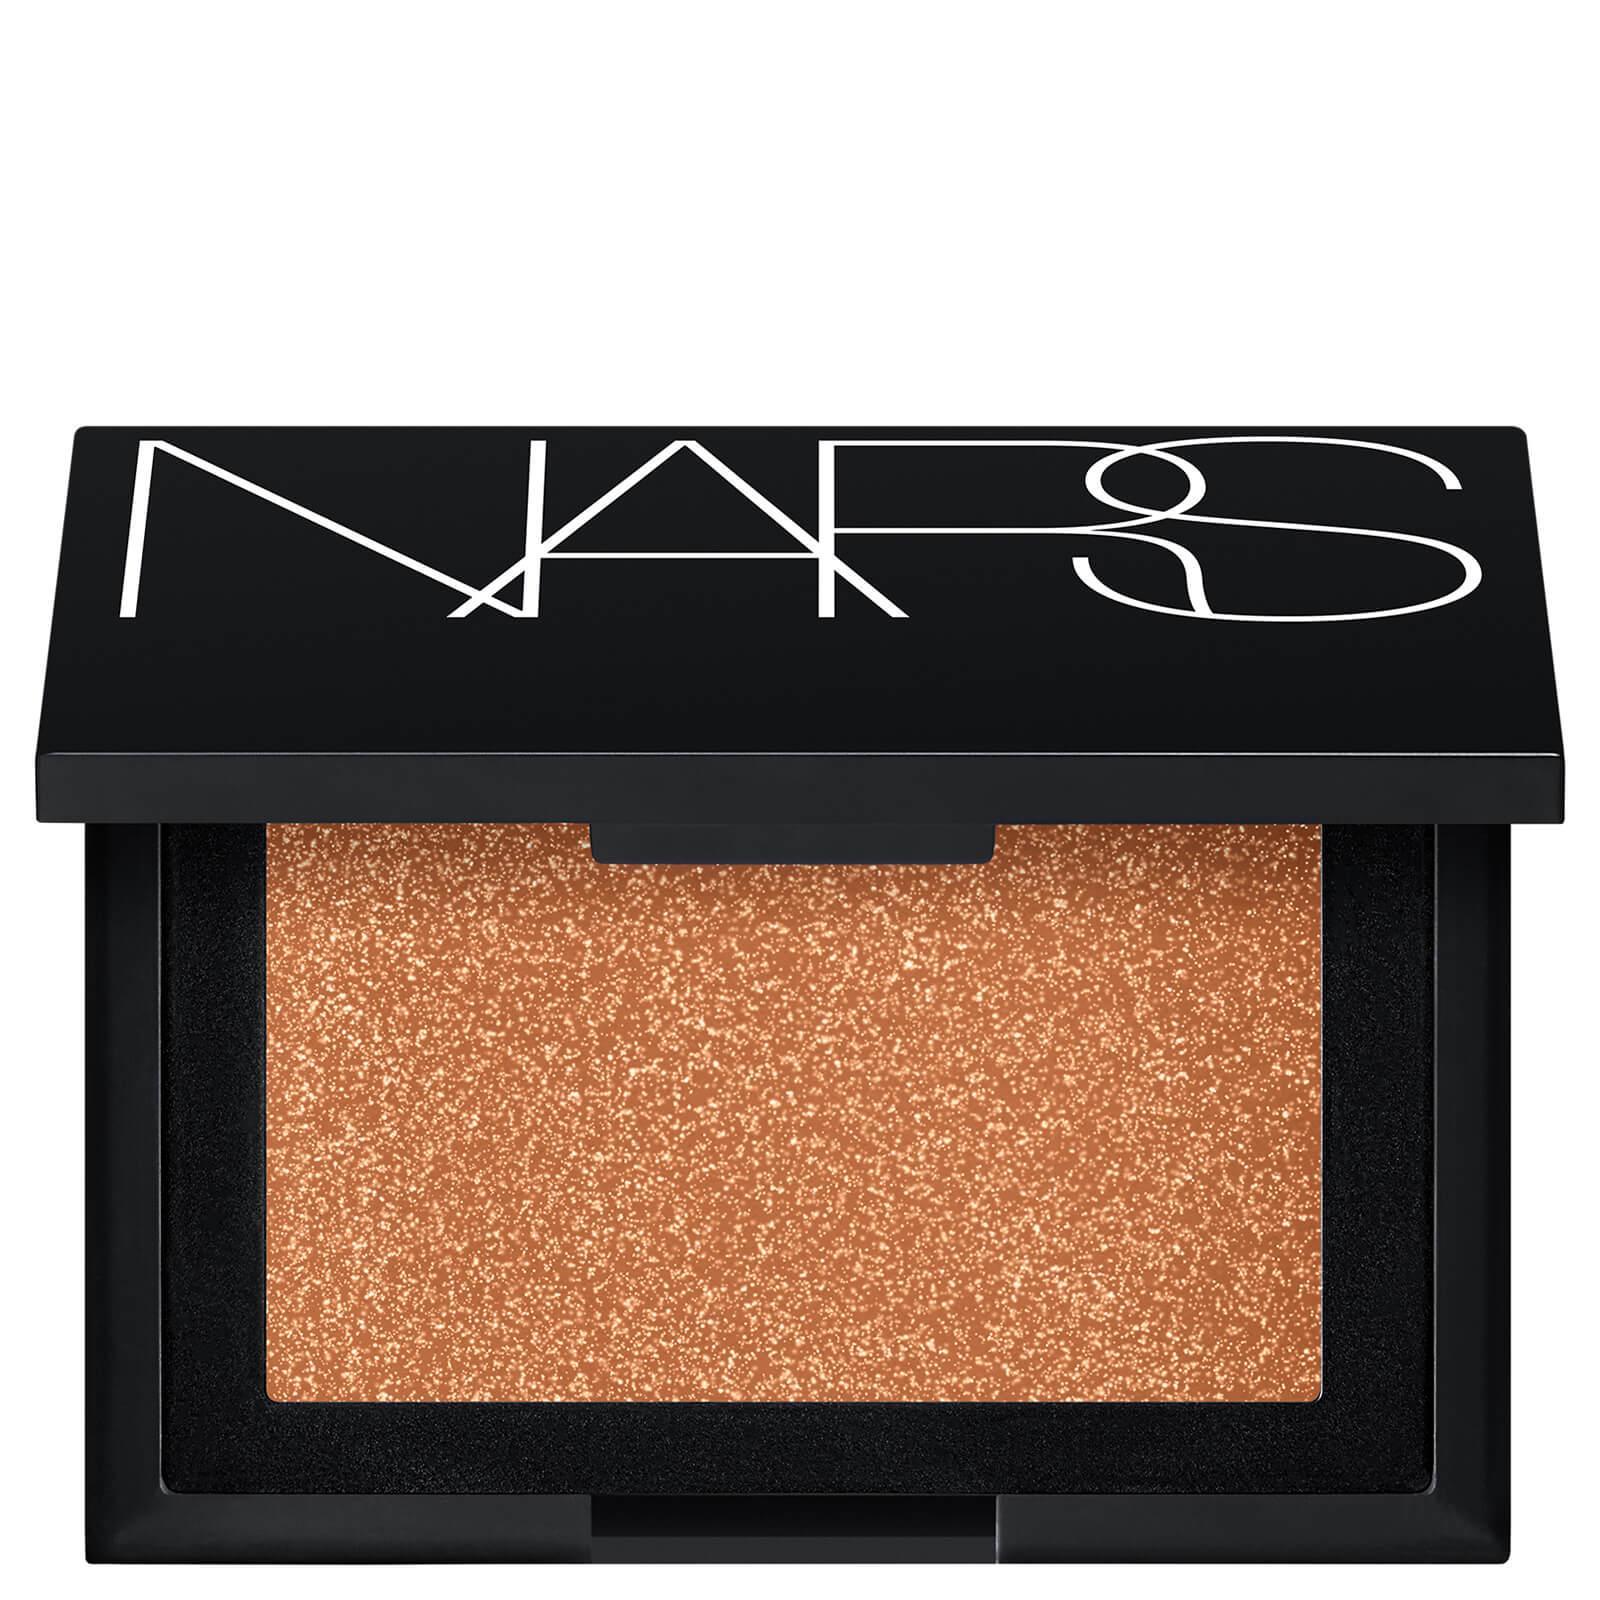 NARS Cosmetics Light Sculpting Highlighting Powder 8g (Various Shades) - St. Barths